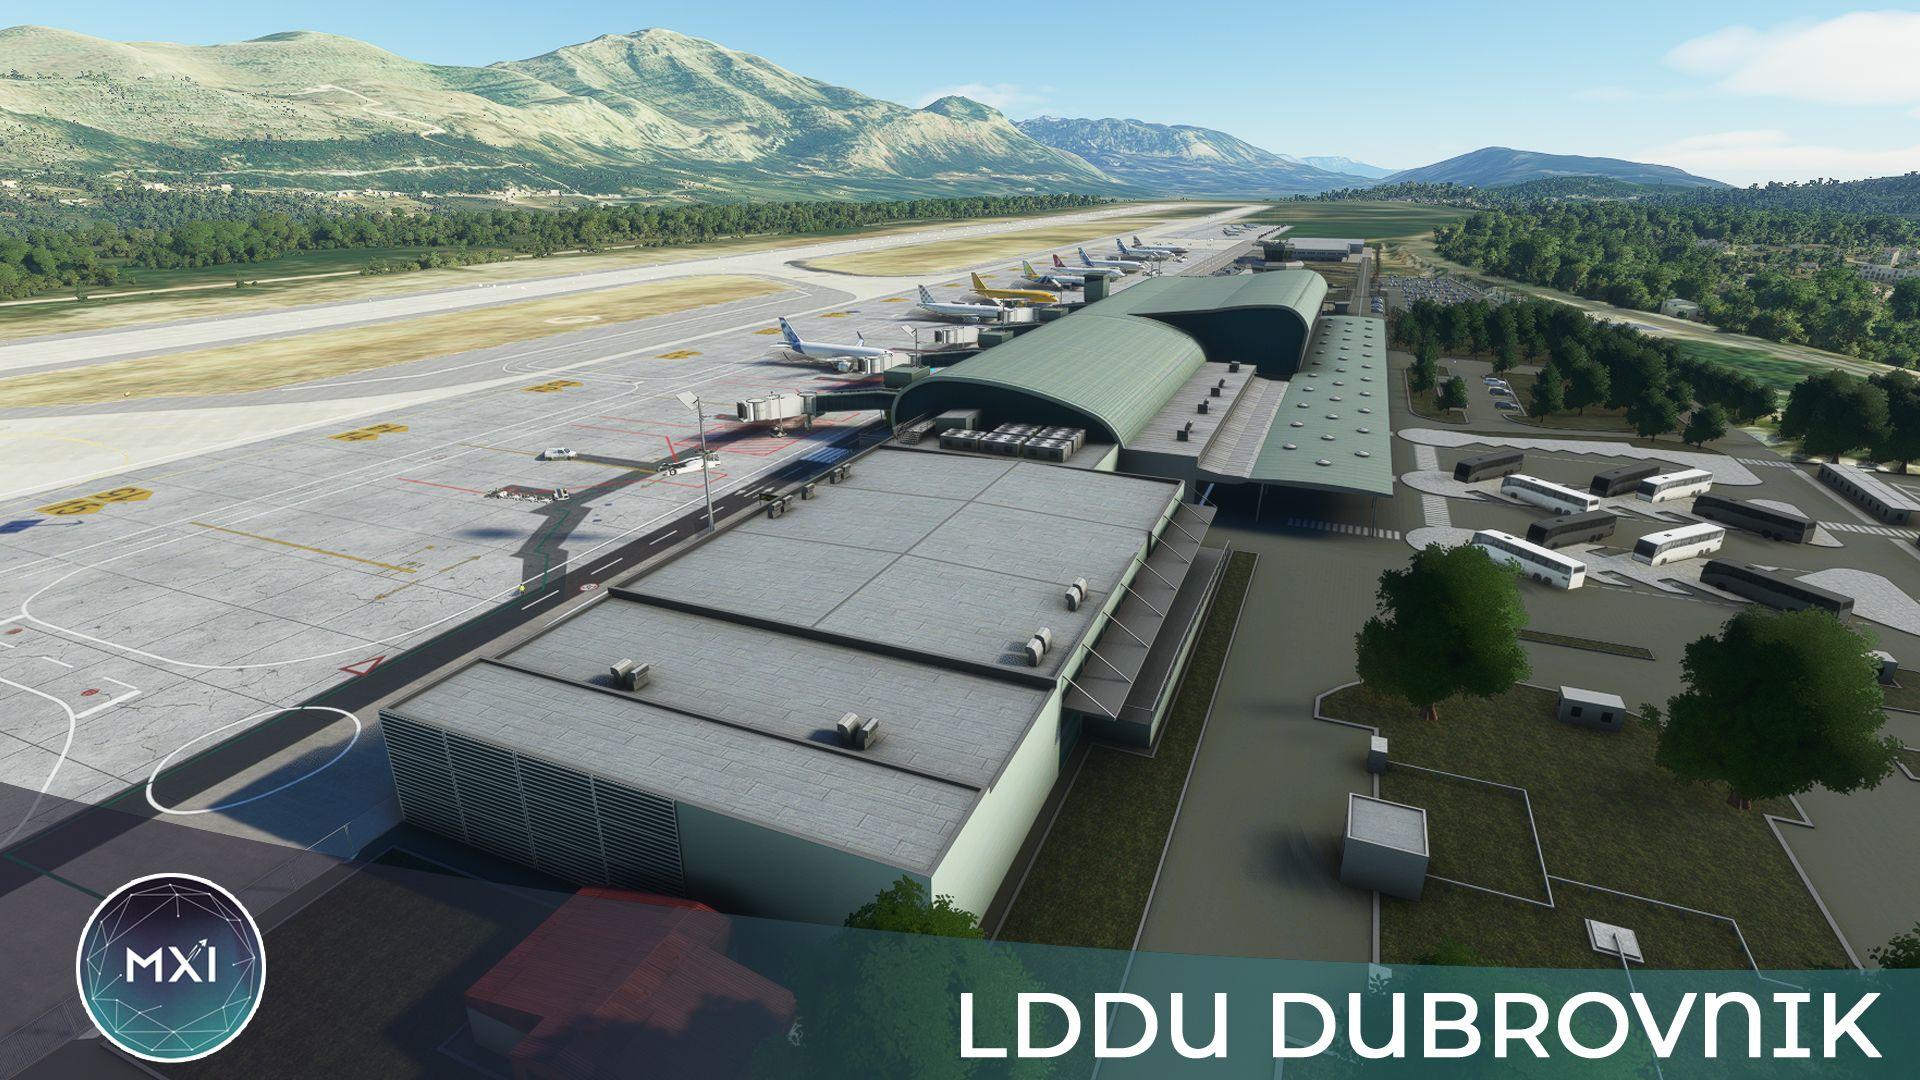 LDDU5.jpg